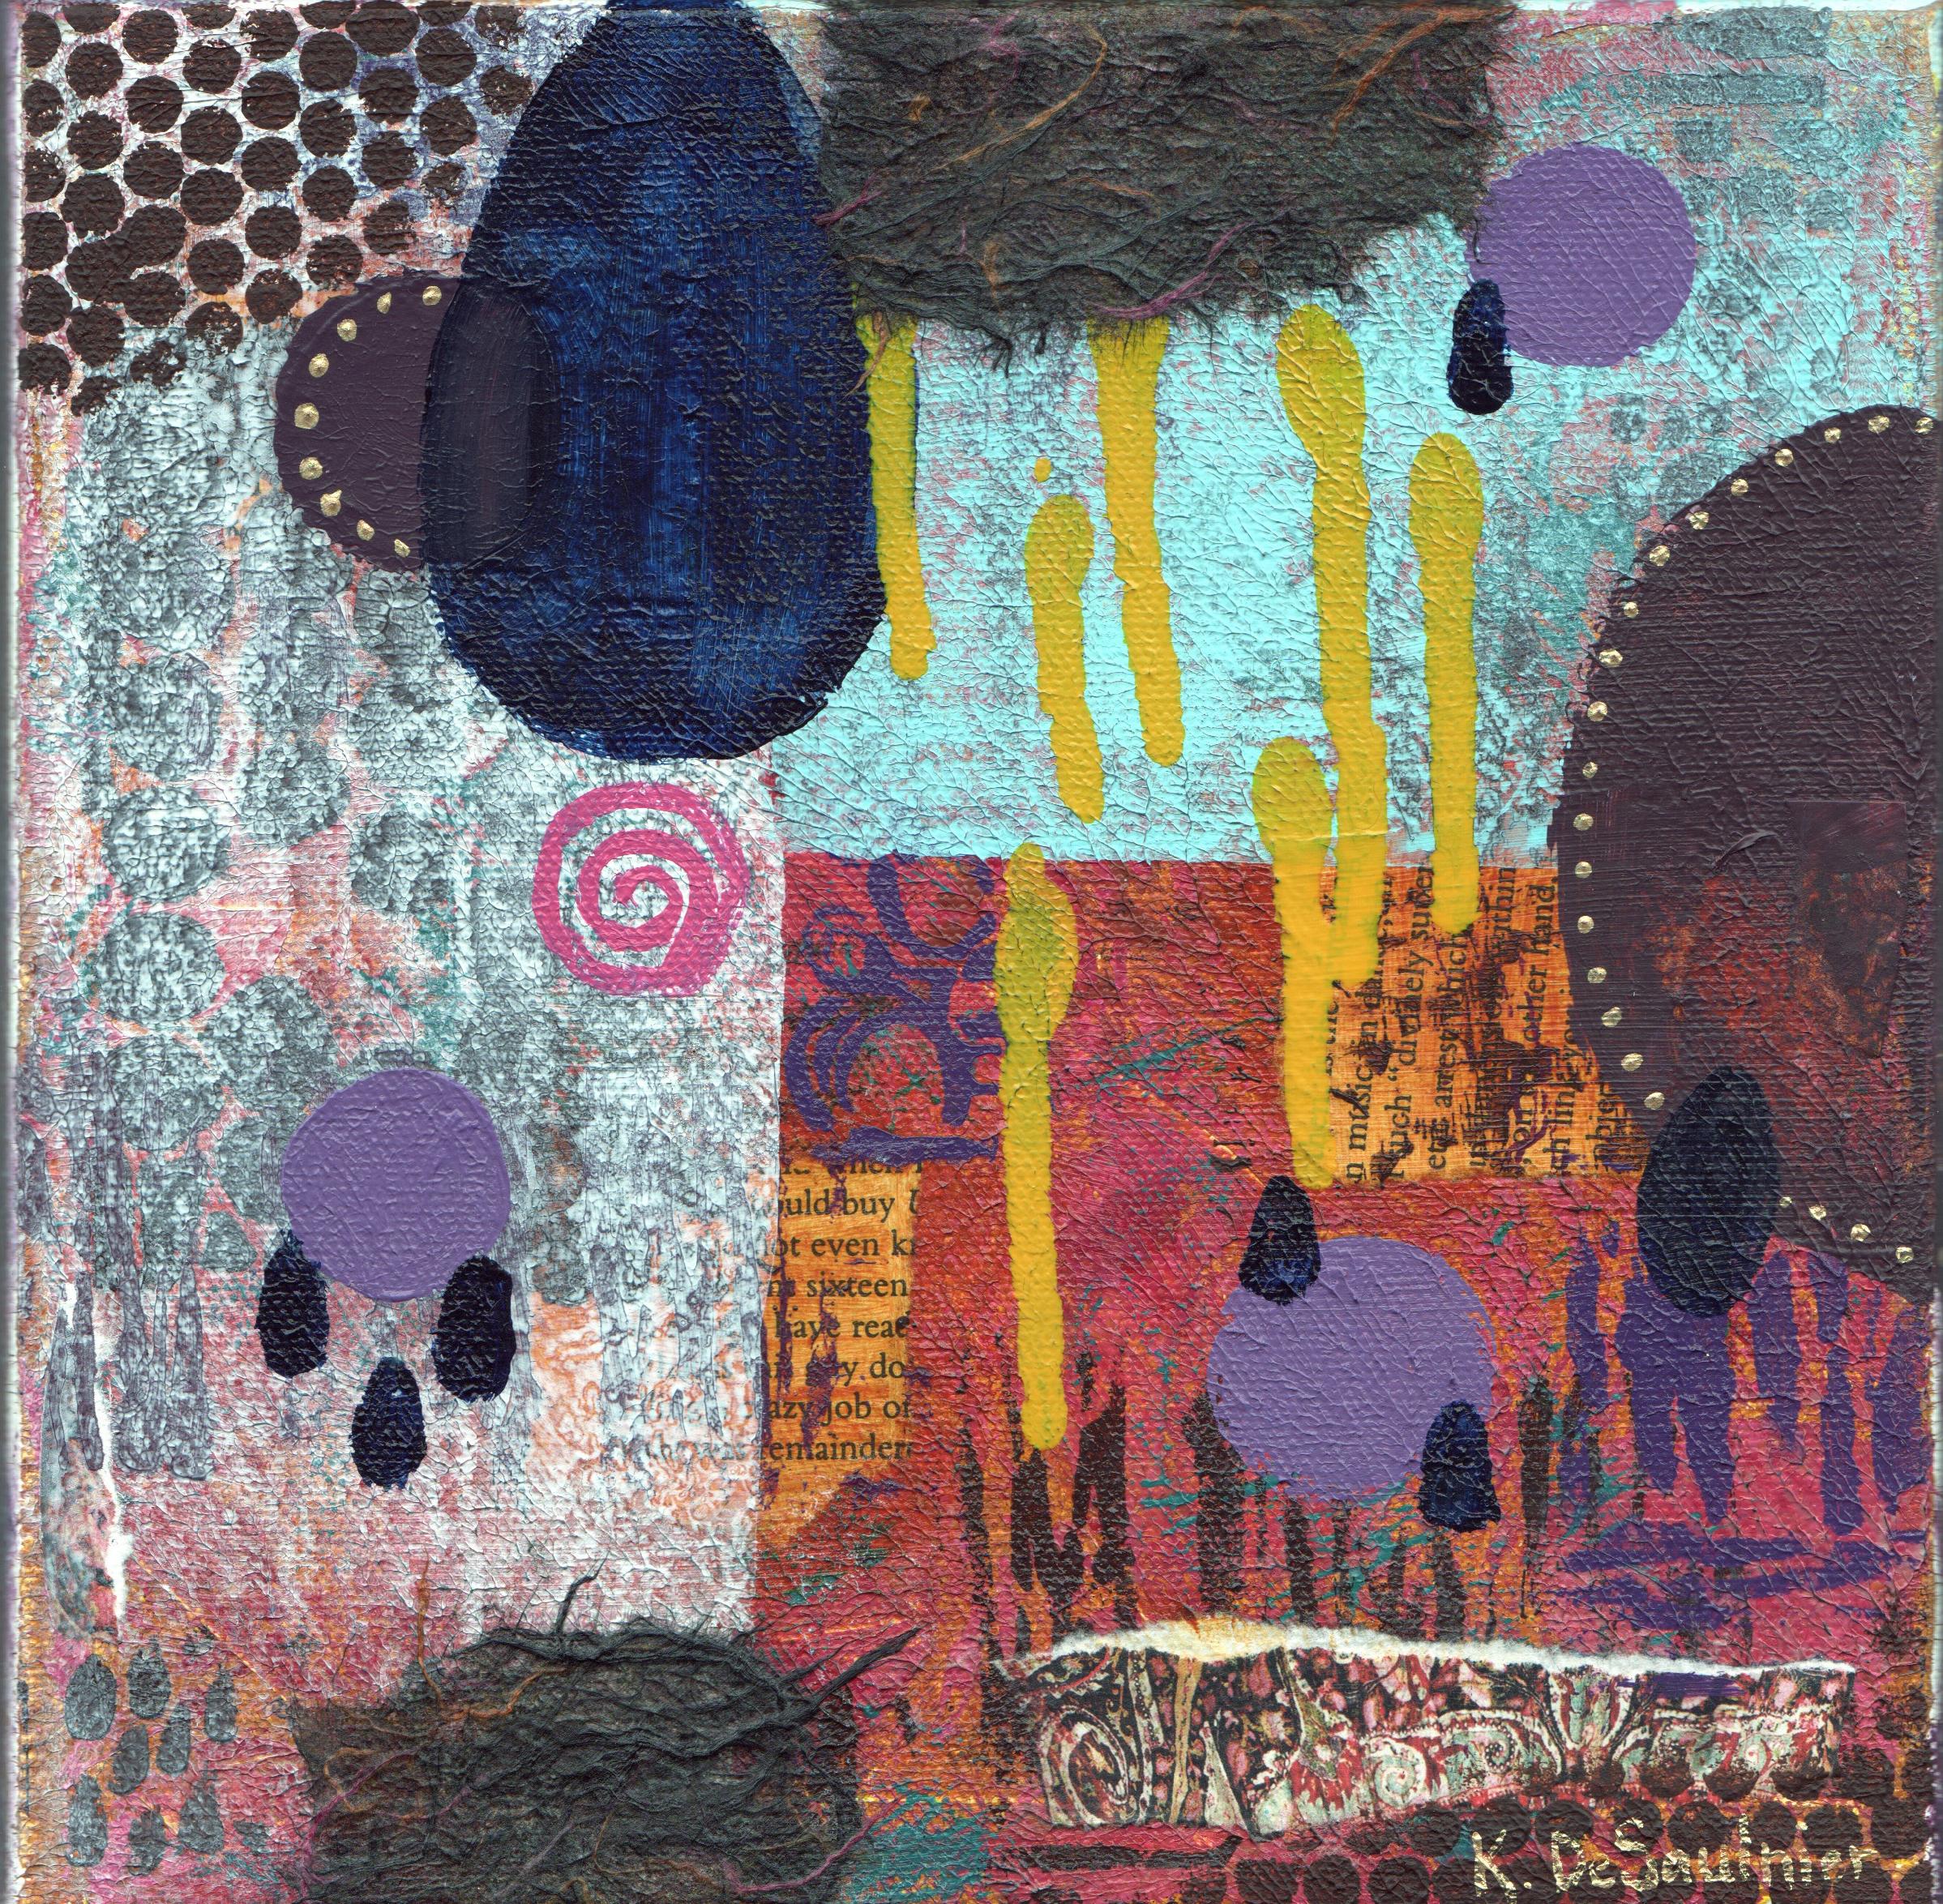 Broken, 8X8, mixed media: acrylic, paper on canvas